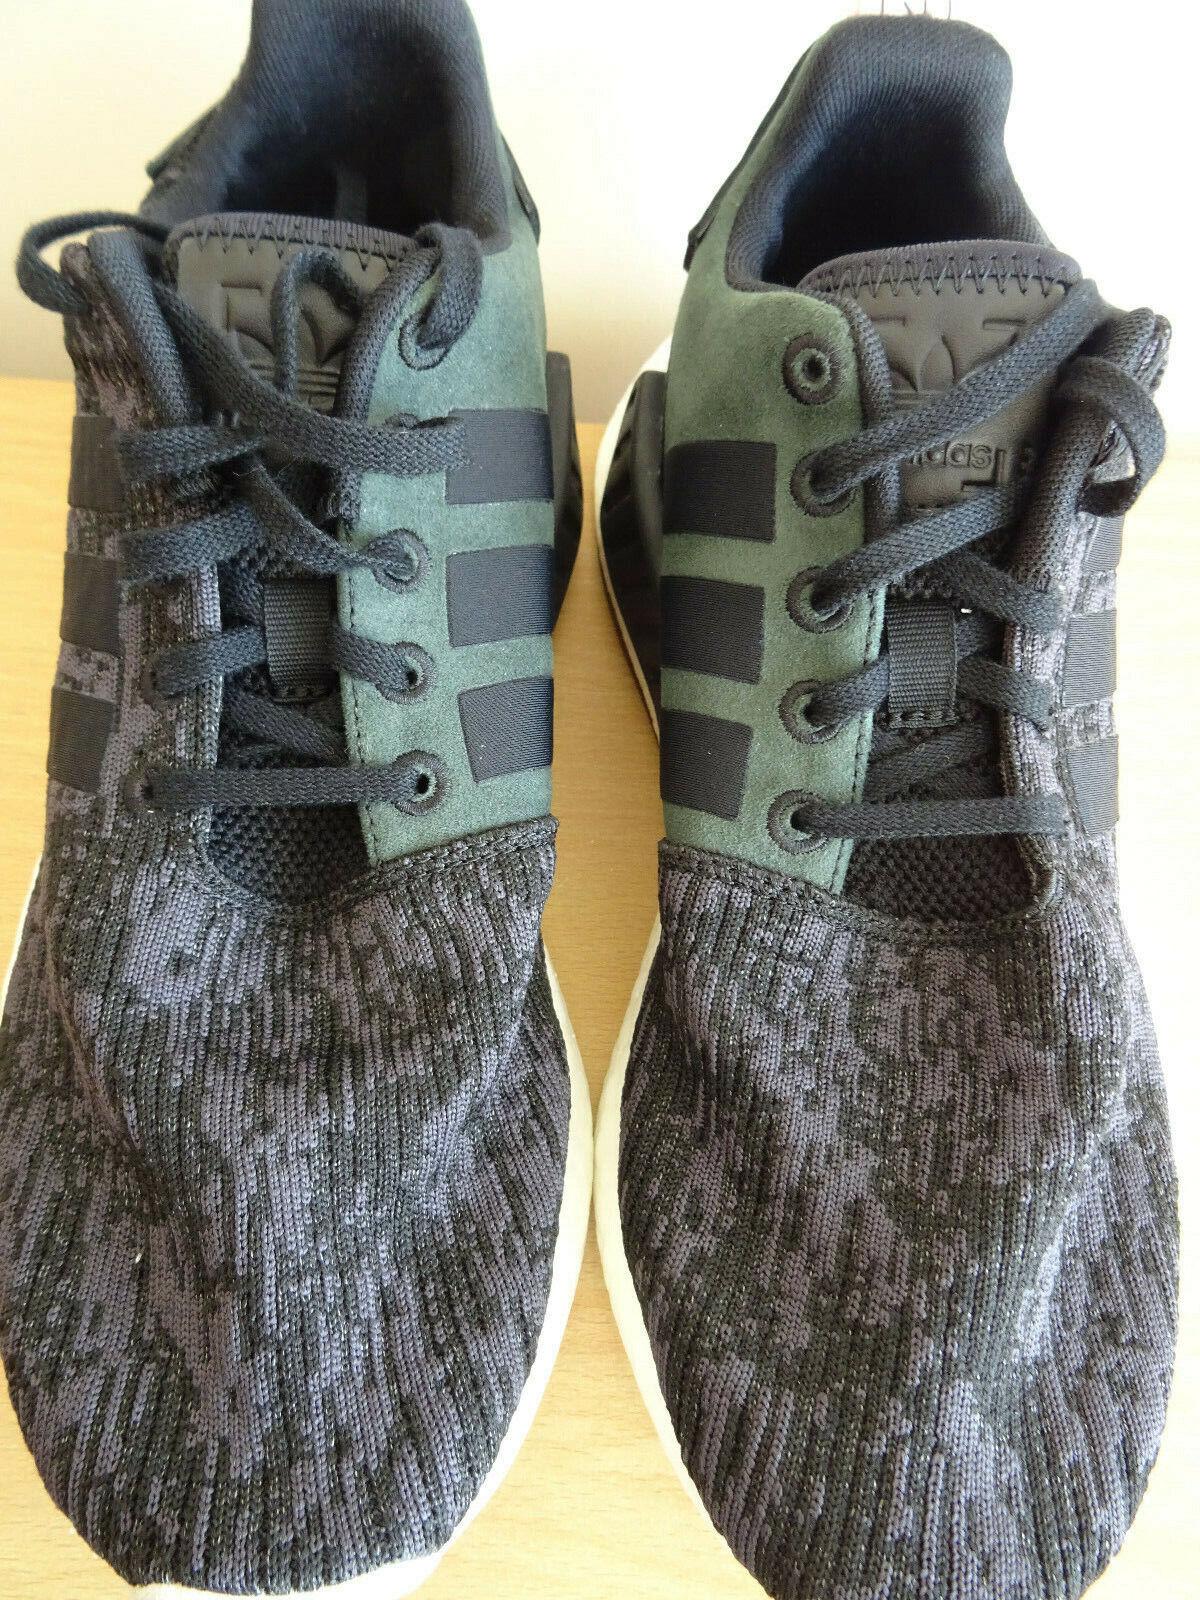 Adidas Originals nmd_r2 Damen Sneaker Schuhe by9314 UK 7.5 EU 41 13 US 9 NEU